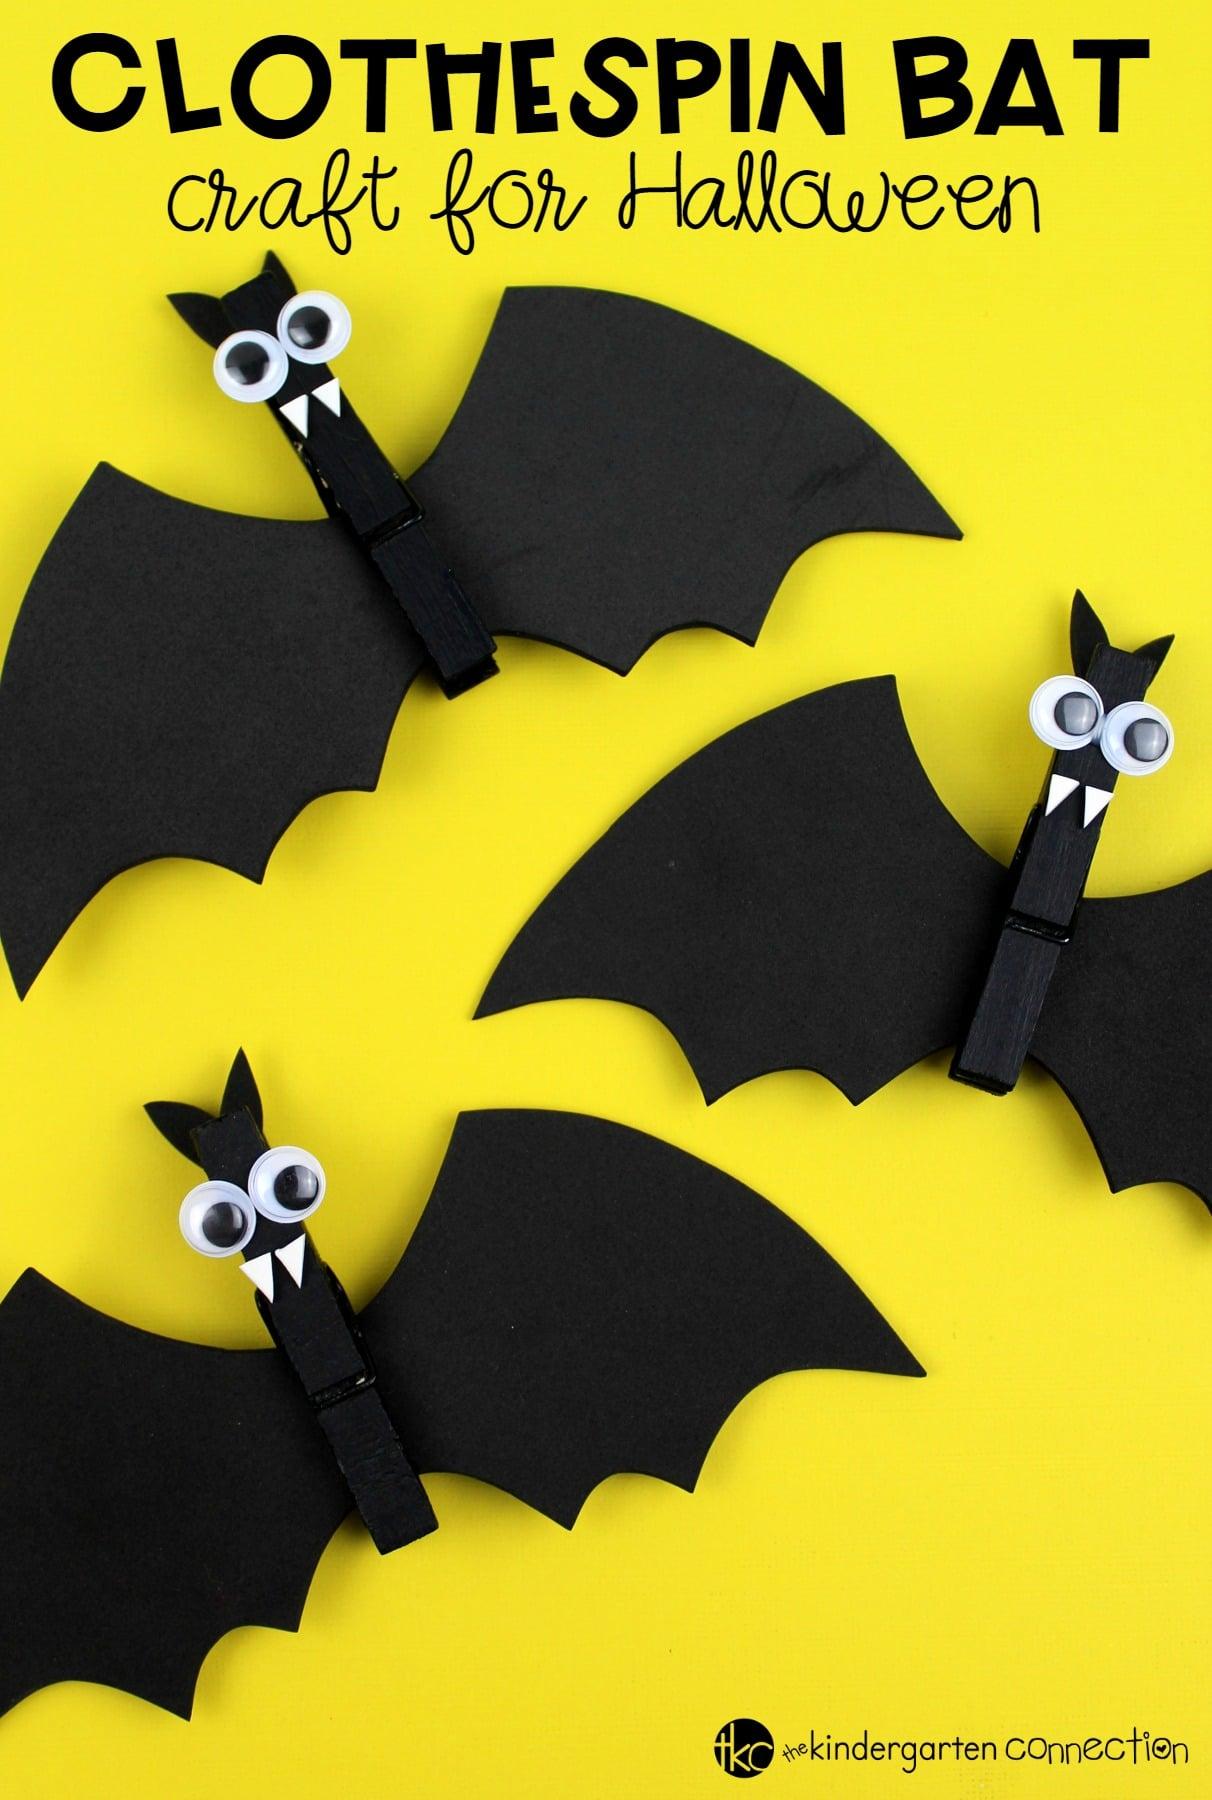 Cute Clothespin Bat Craft For Halloween